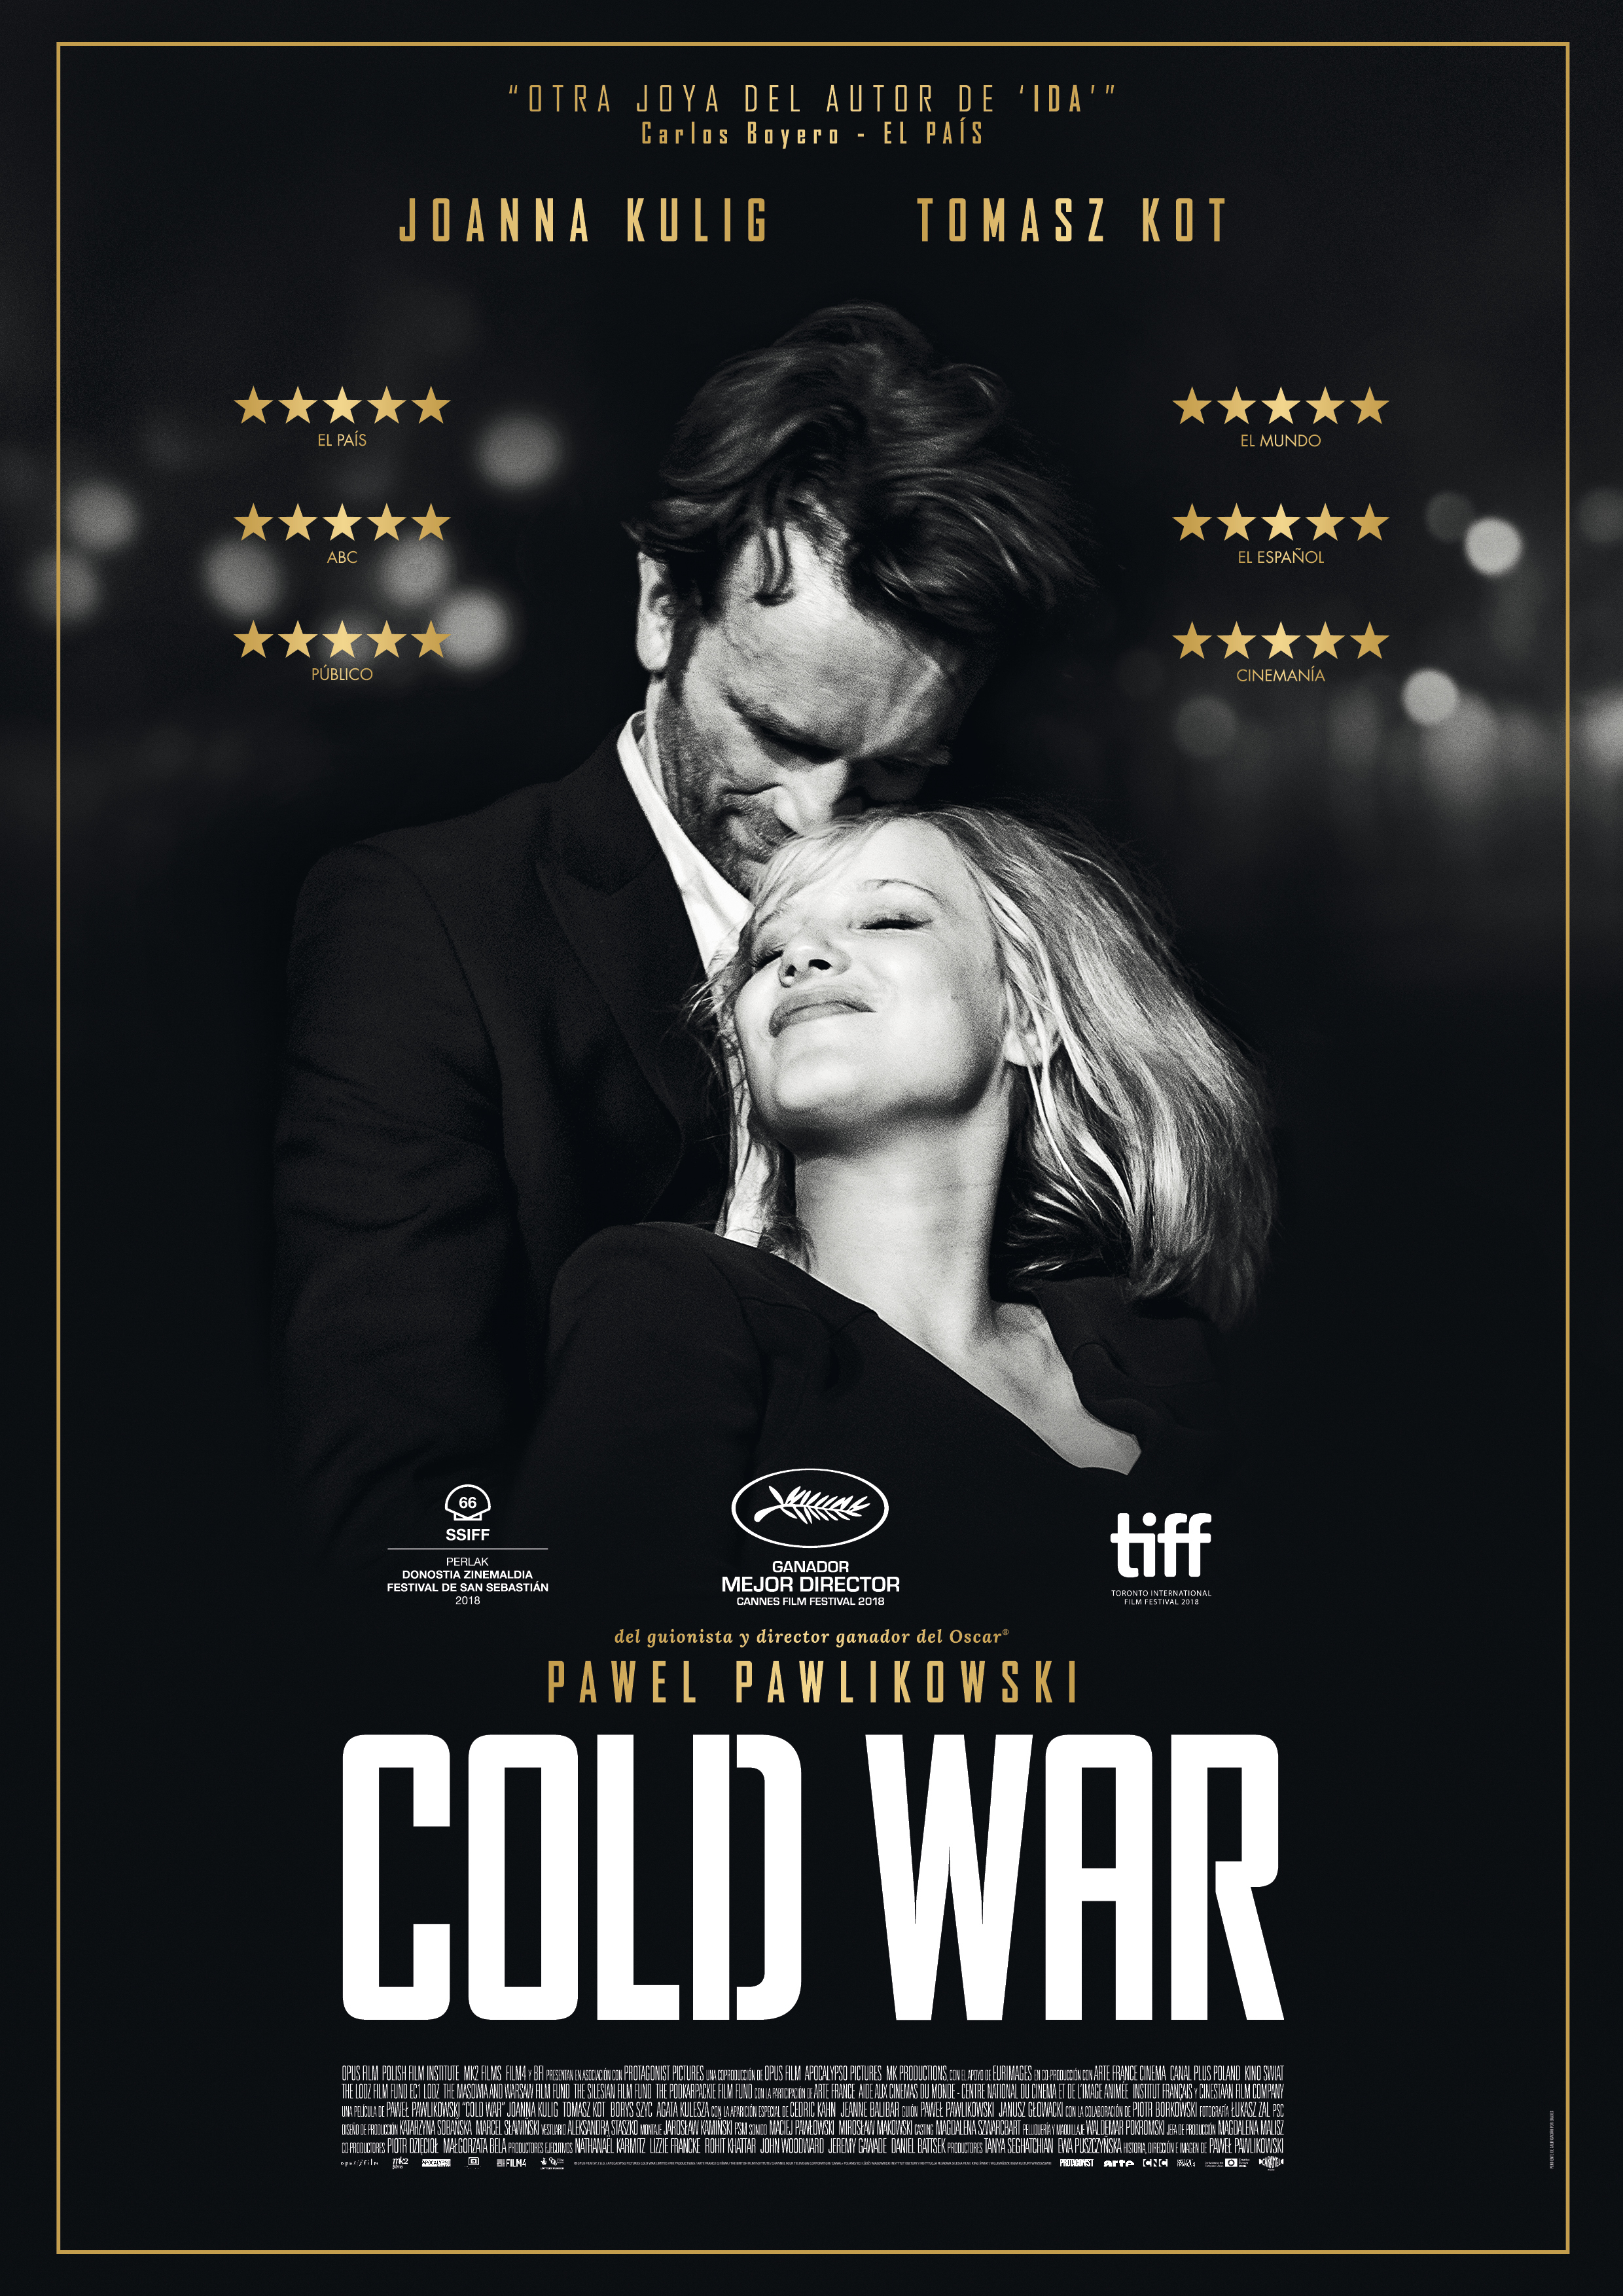 Cartel de Cold War